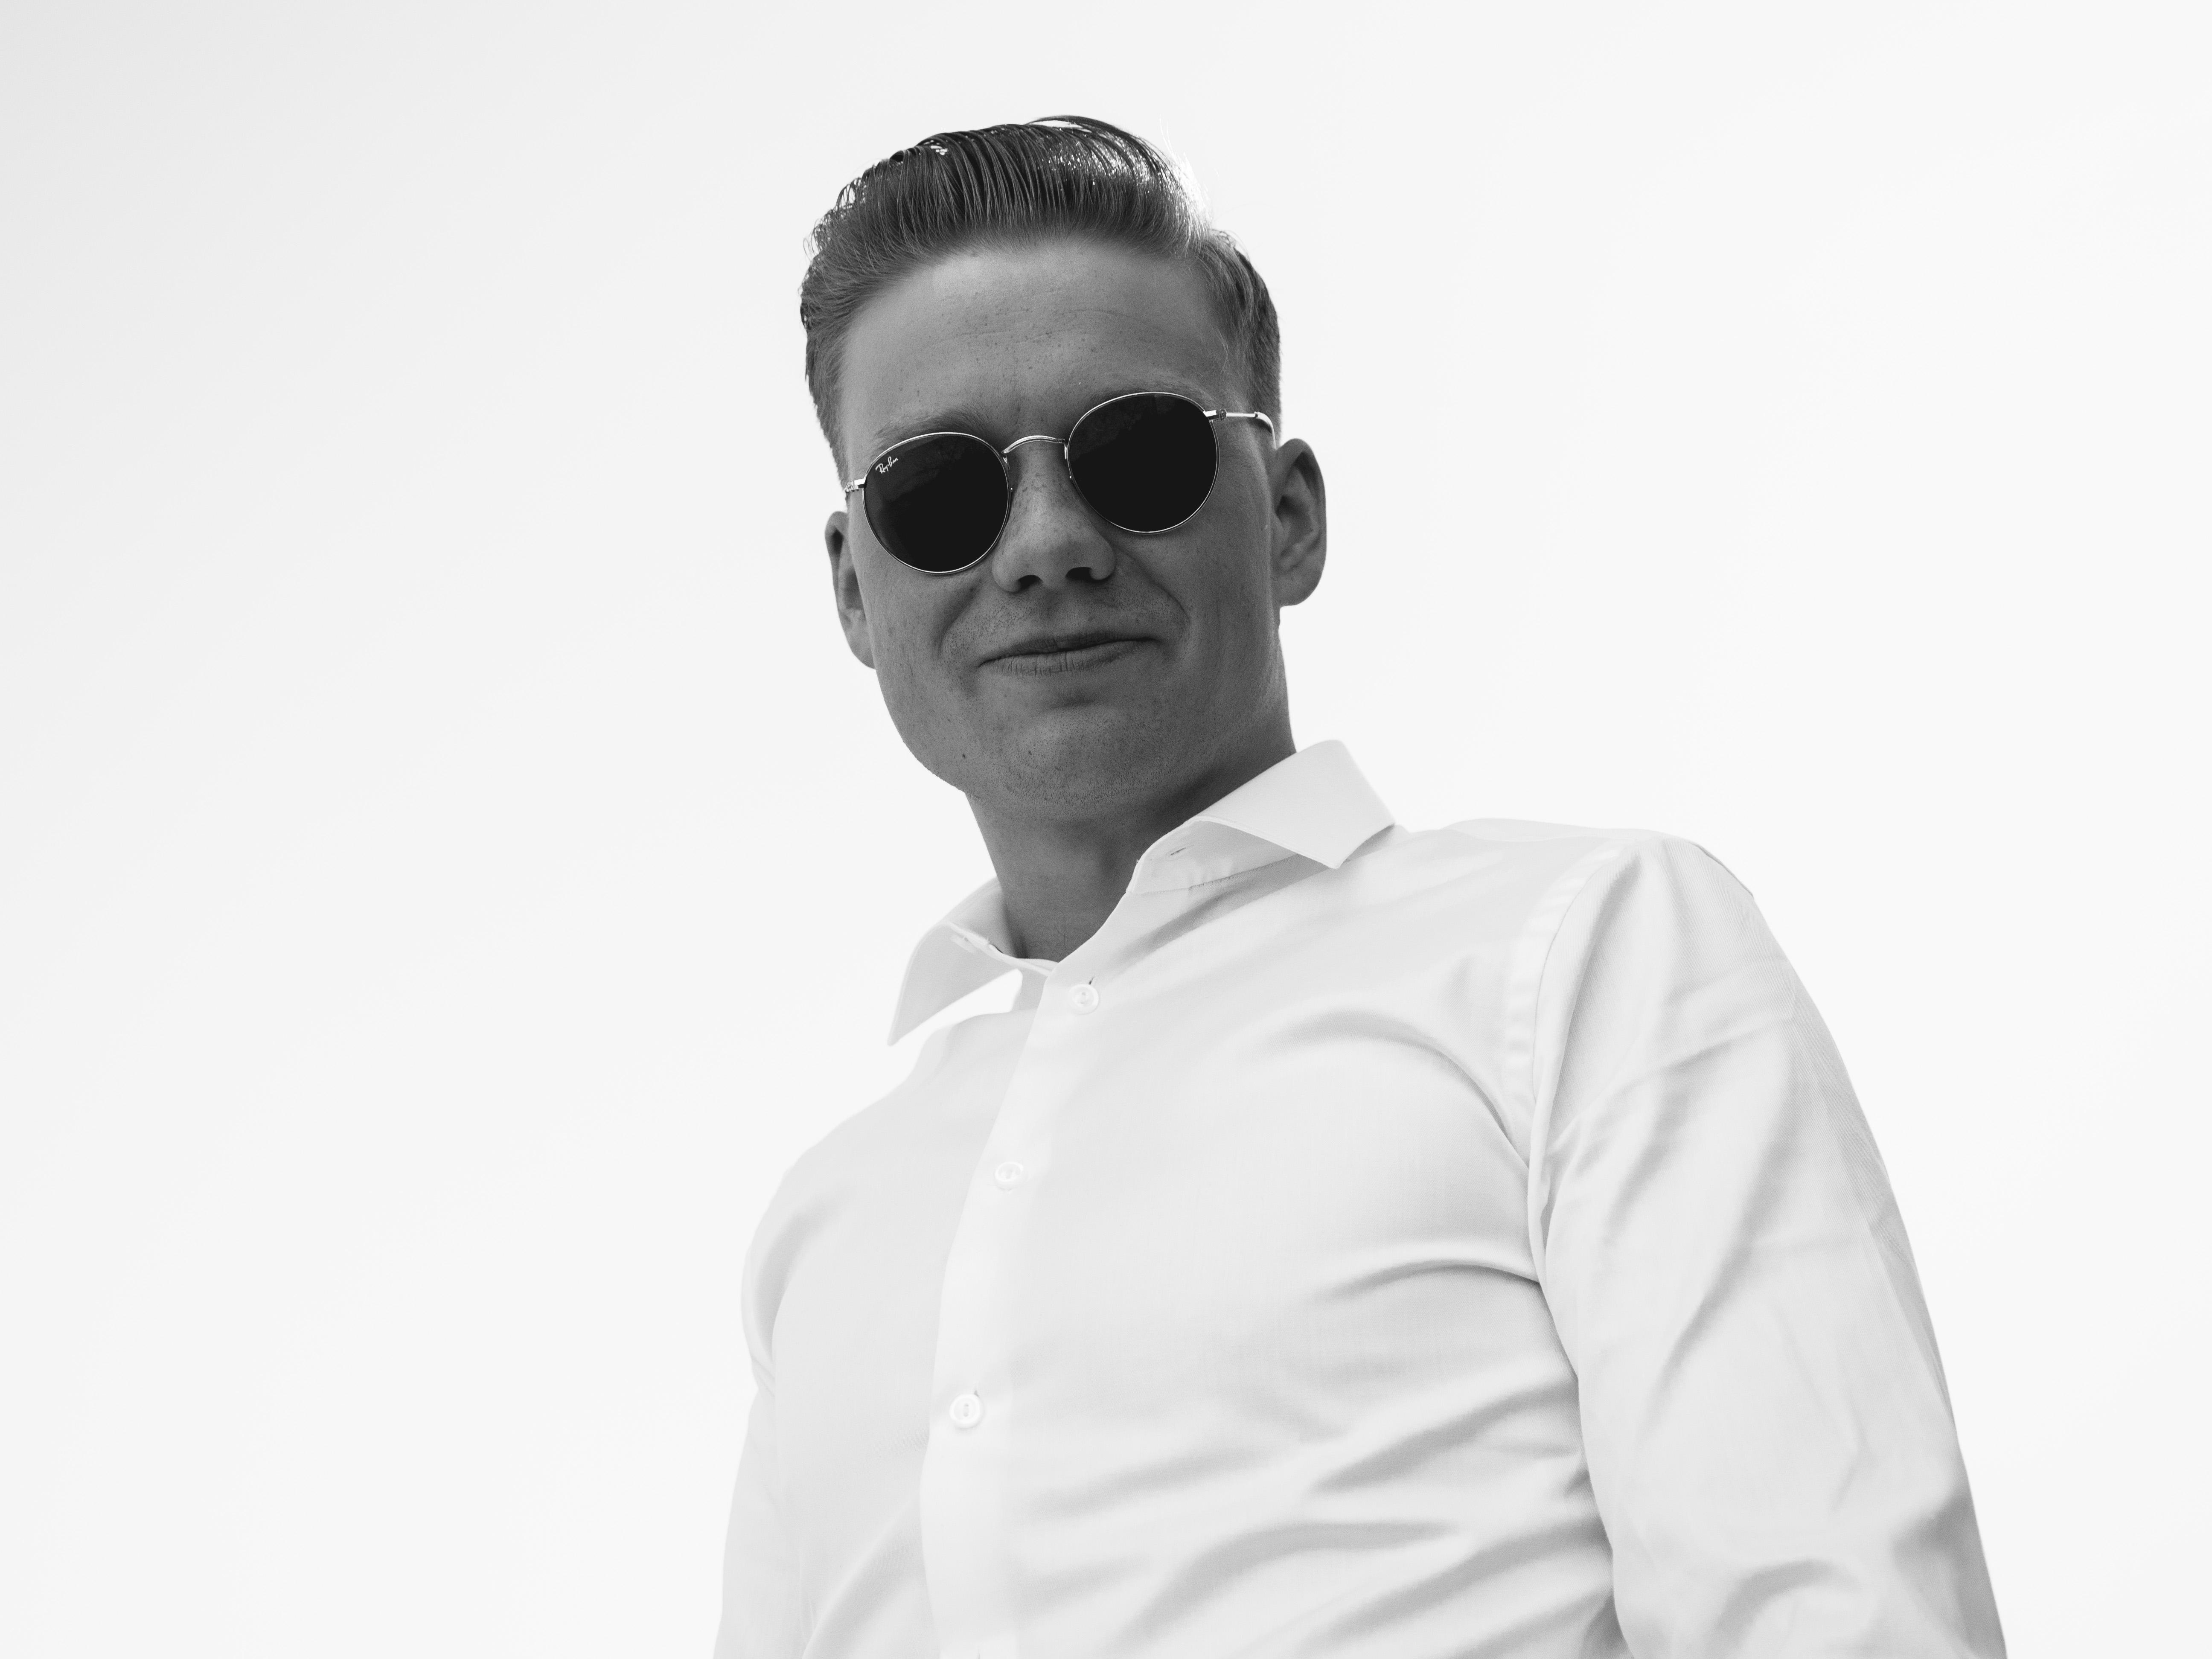 17. Mai 2019 - Man with Sunglasses